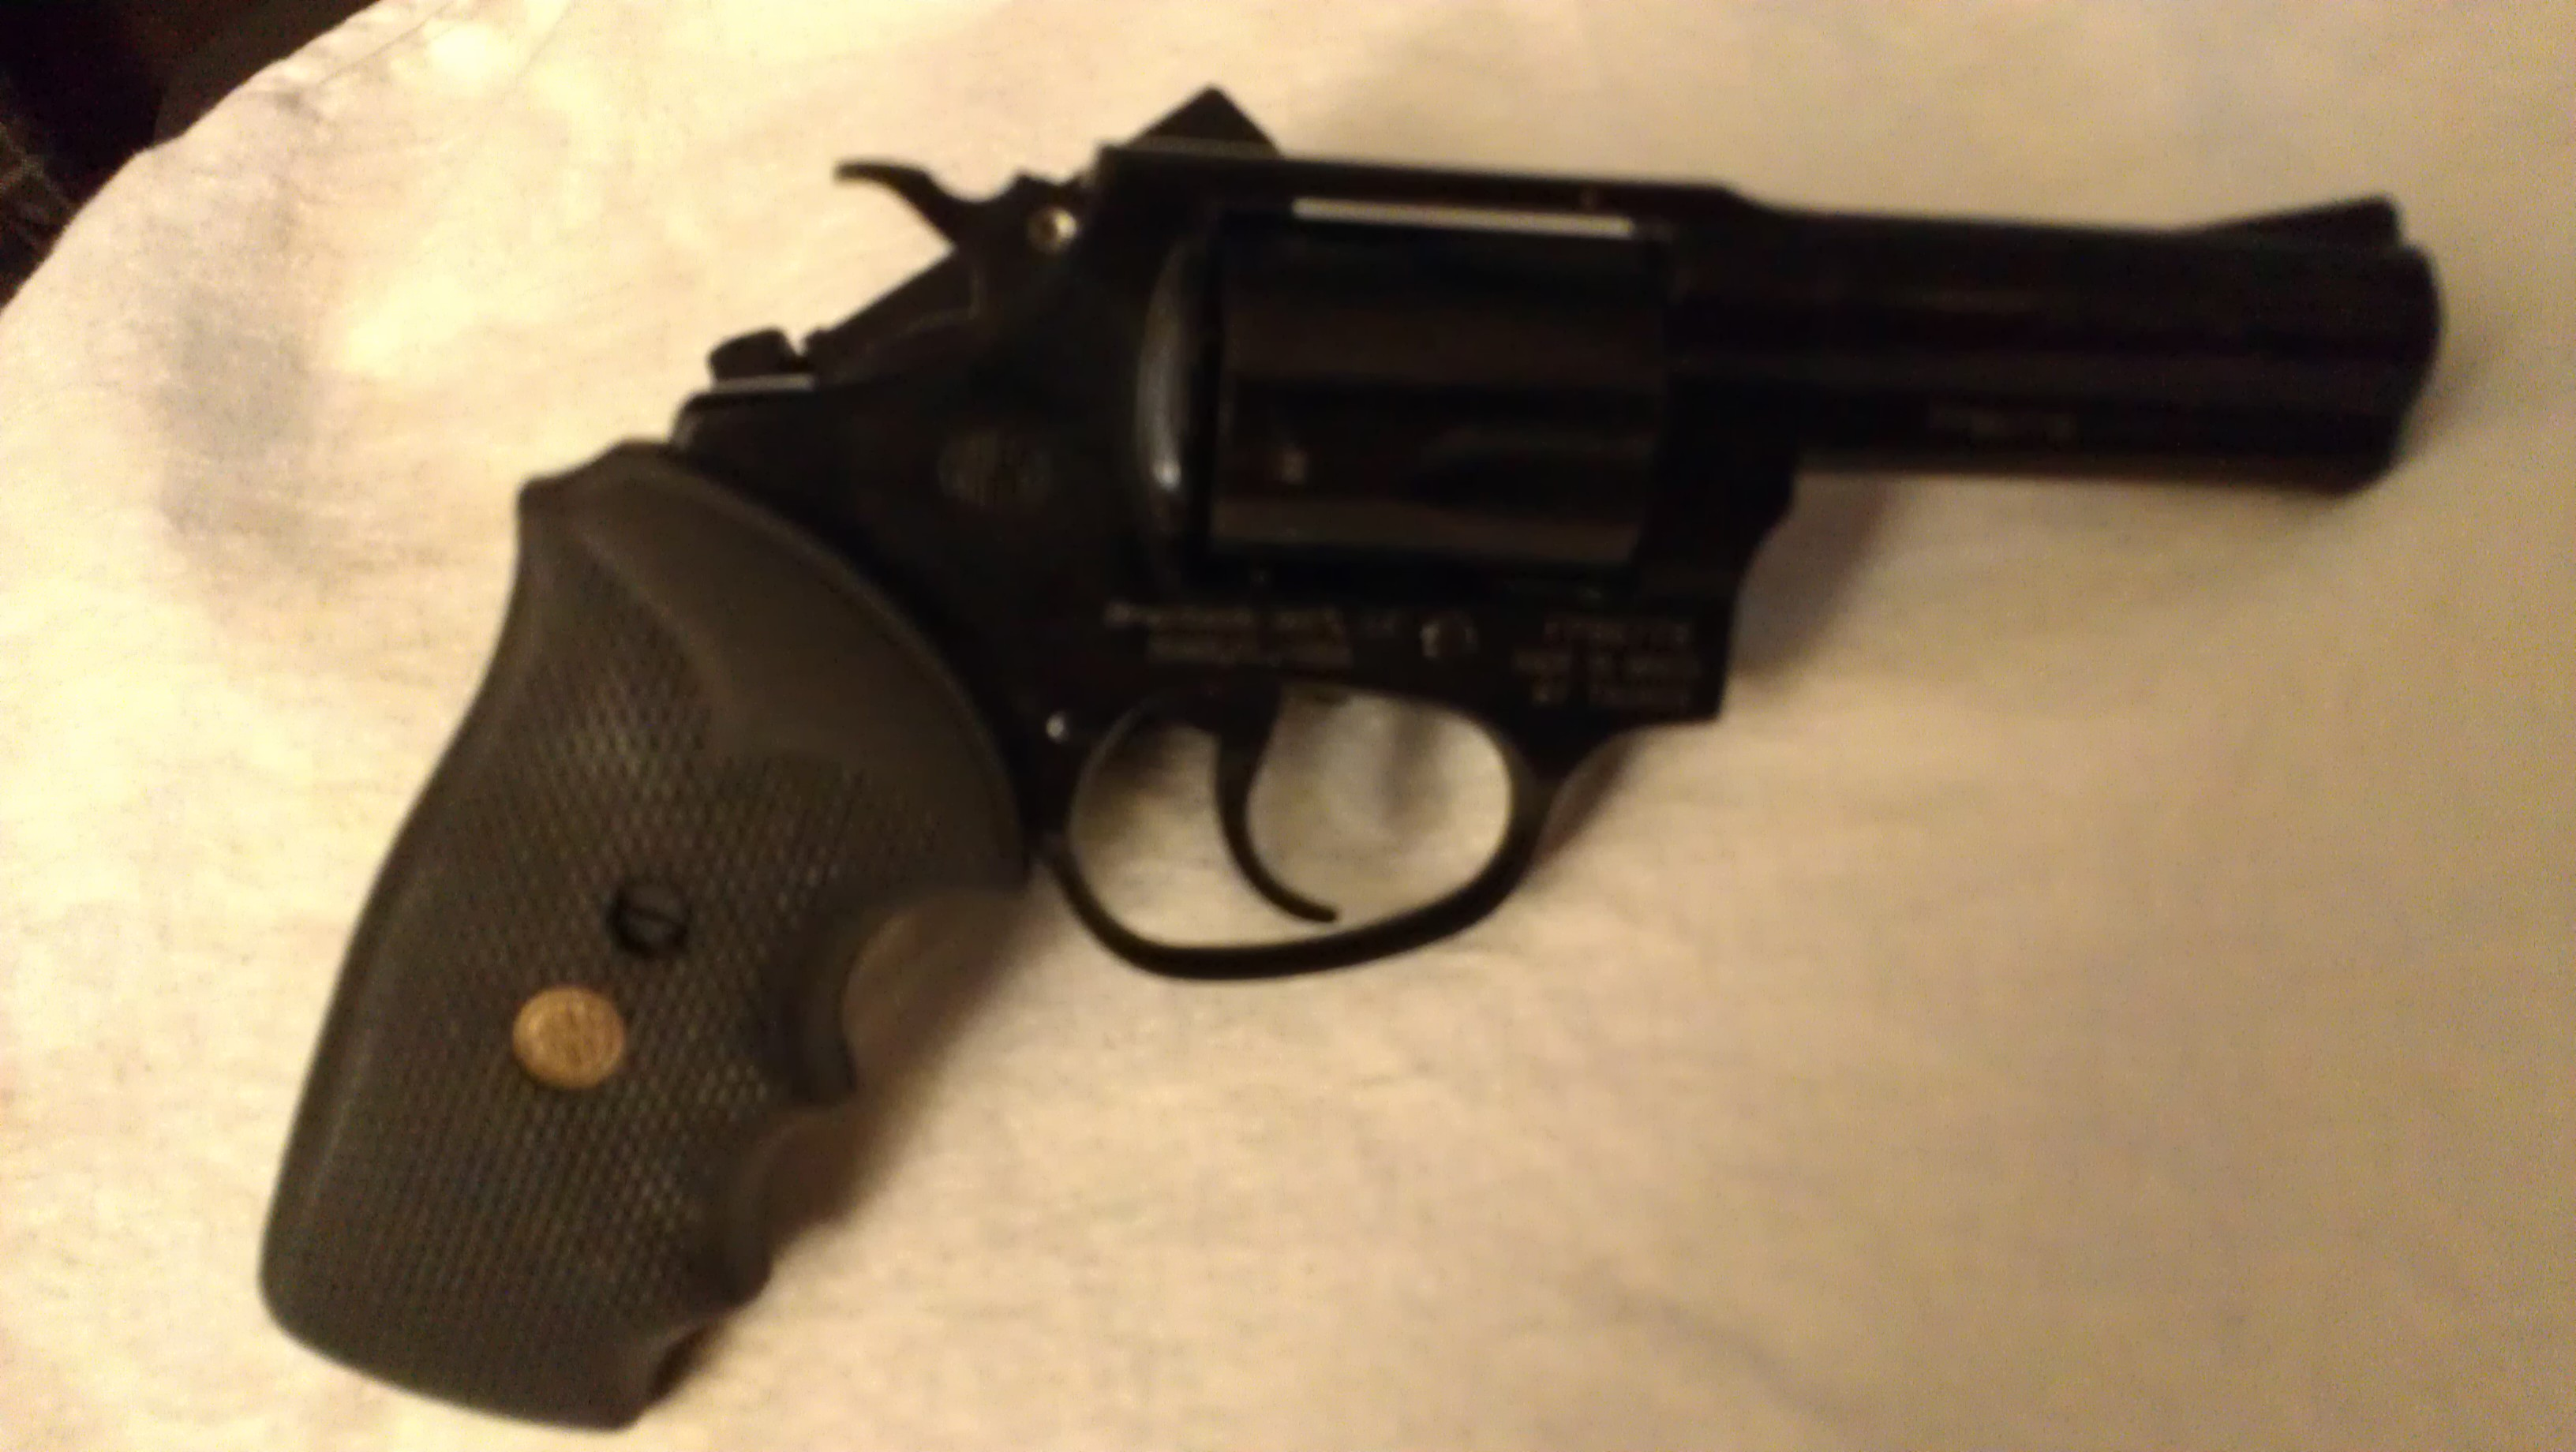 Picked up a Rossi R35103  38 SPL + P Revolver